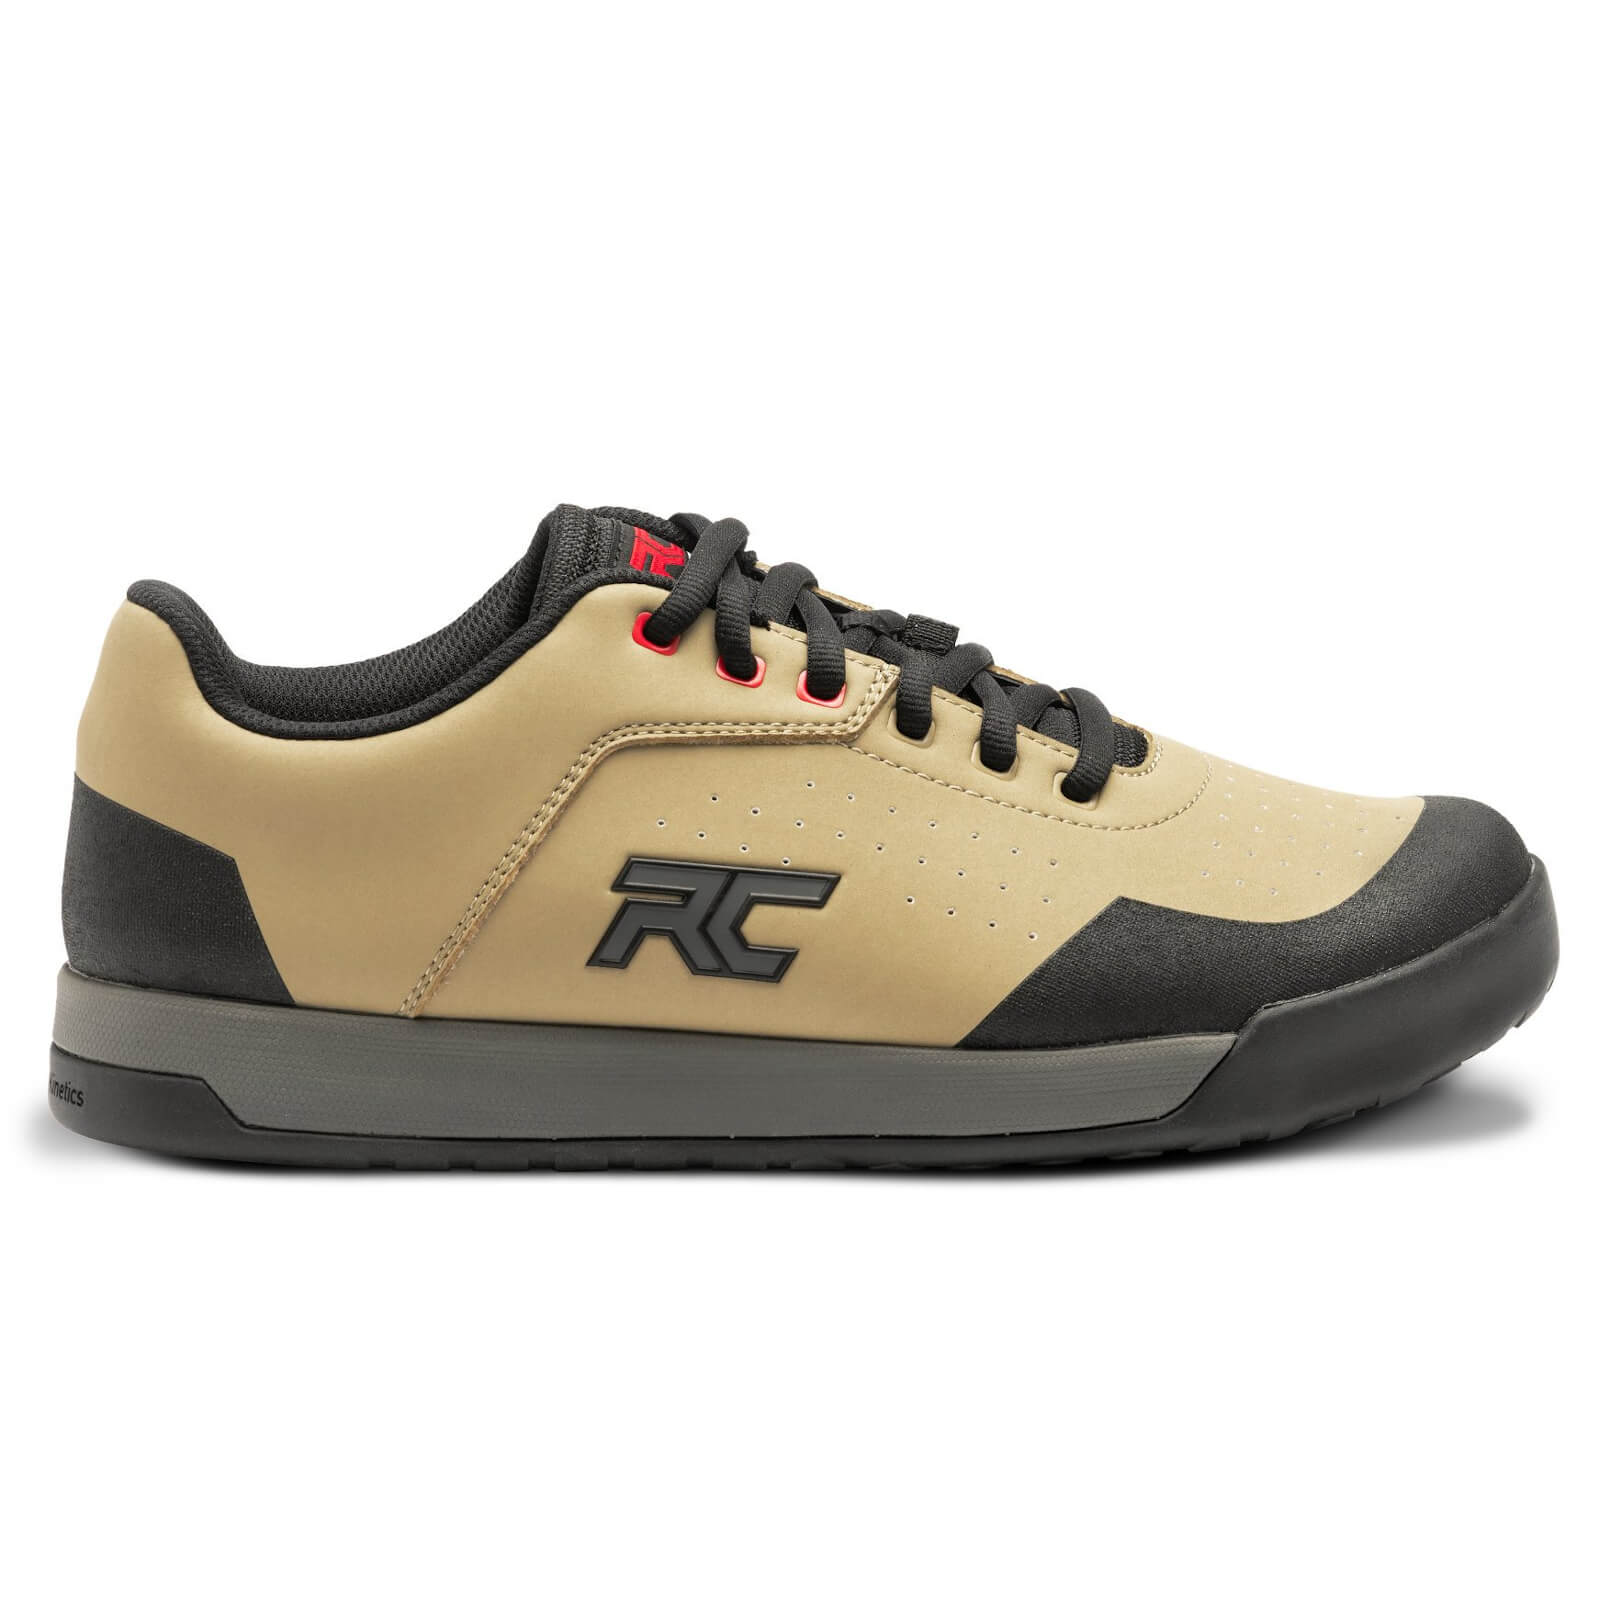 Ride Concepts Hellion Elite Flat MTB Shoes - UK 7/EU 41 - Khaki